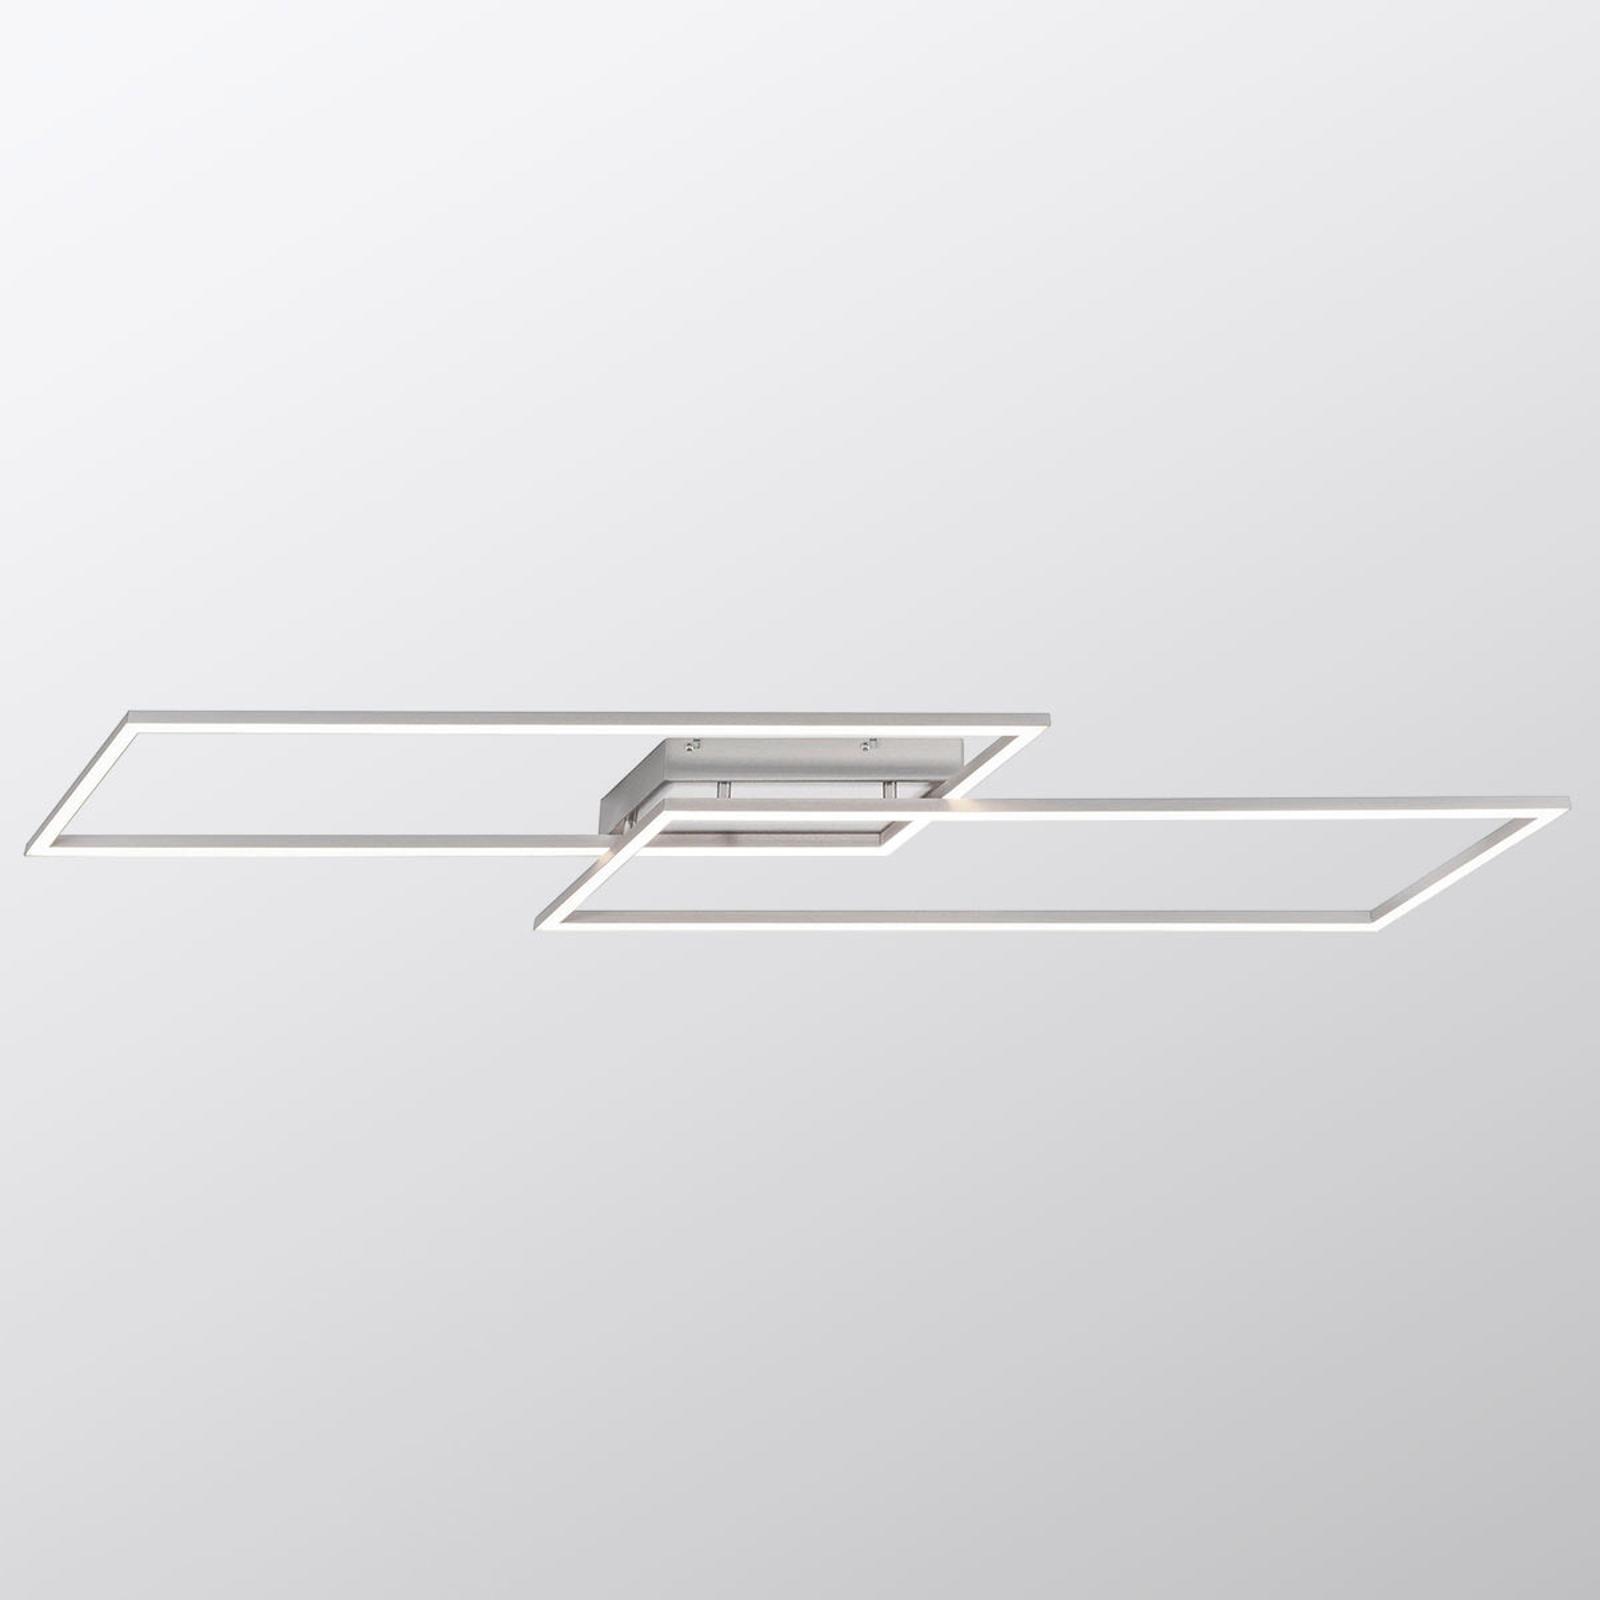 Kaksilamppuinen LED-kattovalaisin Inigo, 113,2 cm